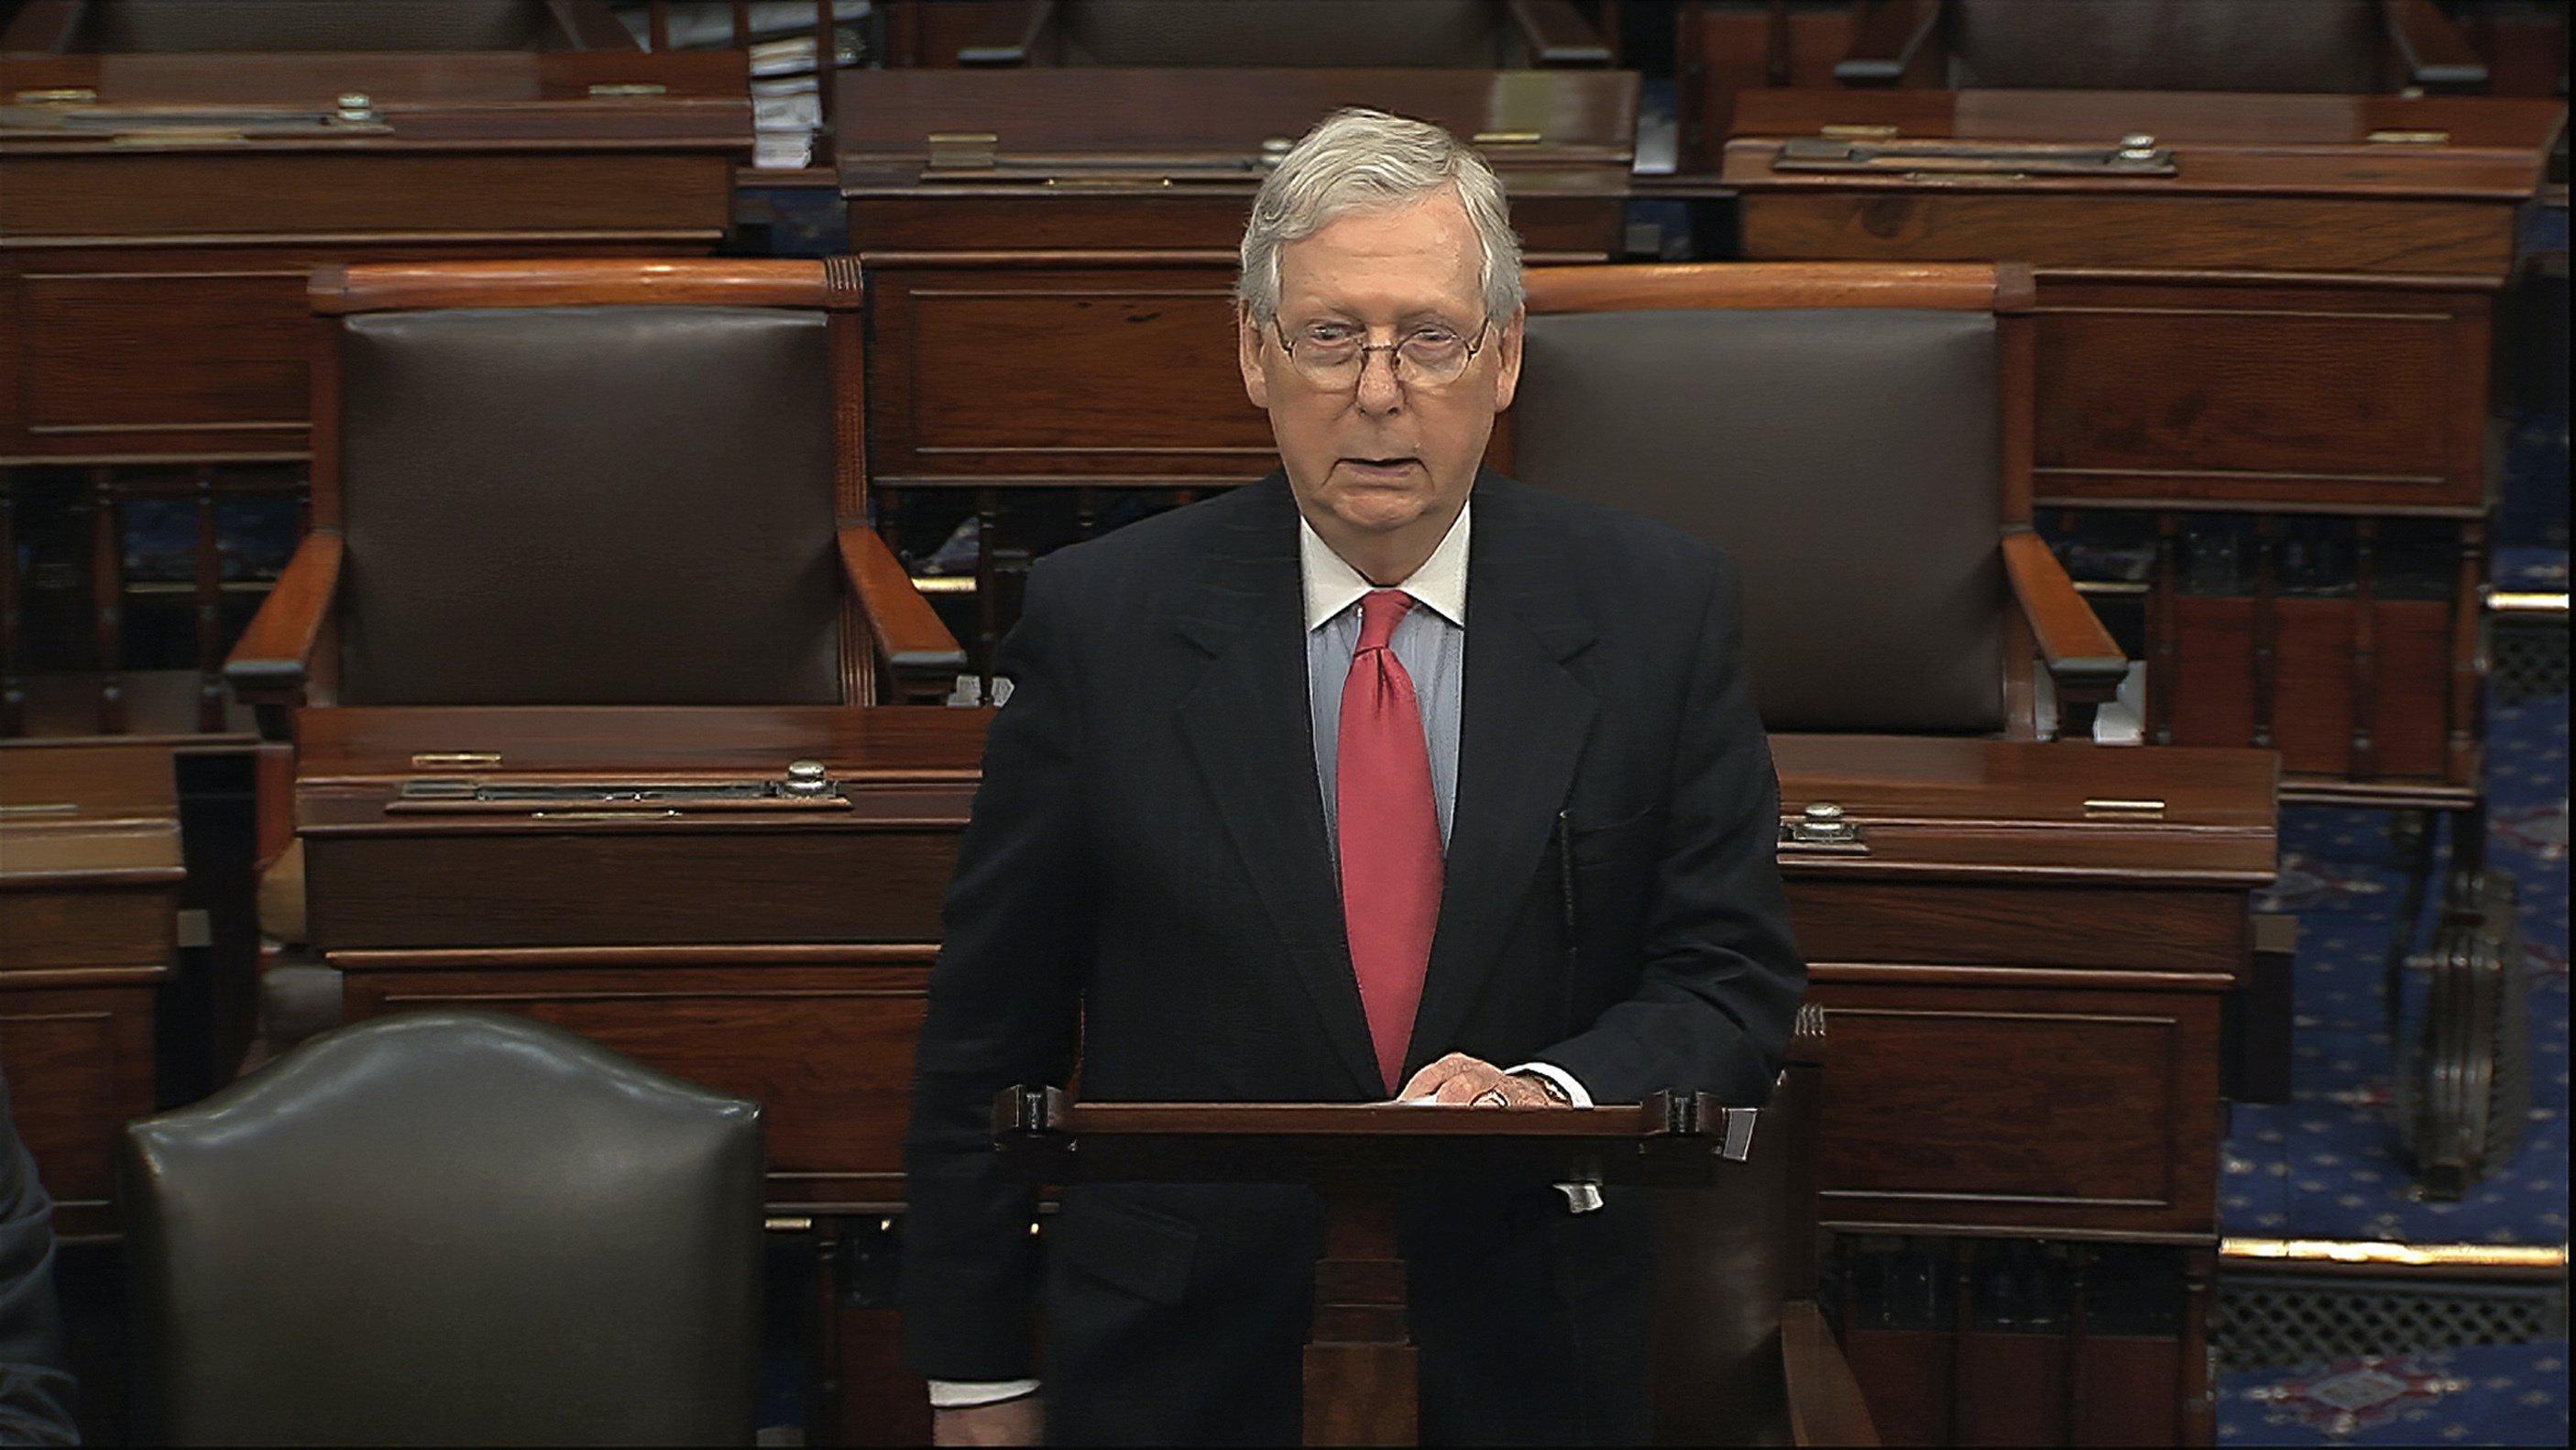 Pelosi forecasts House OK of Senate's $2.2T virus aid plan